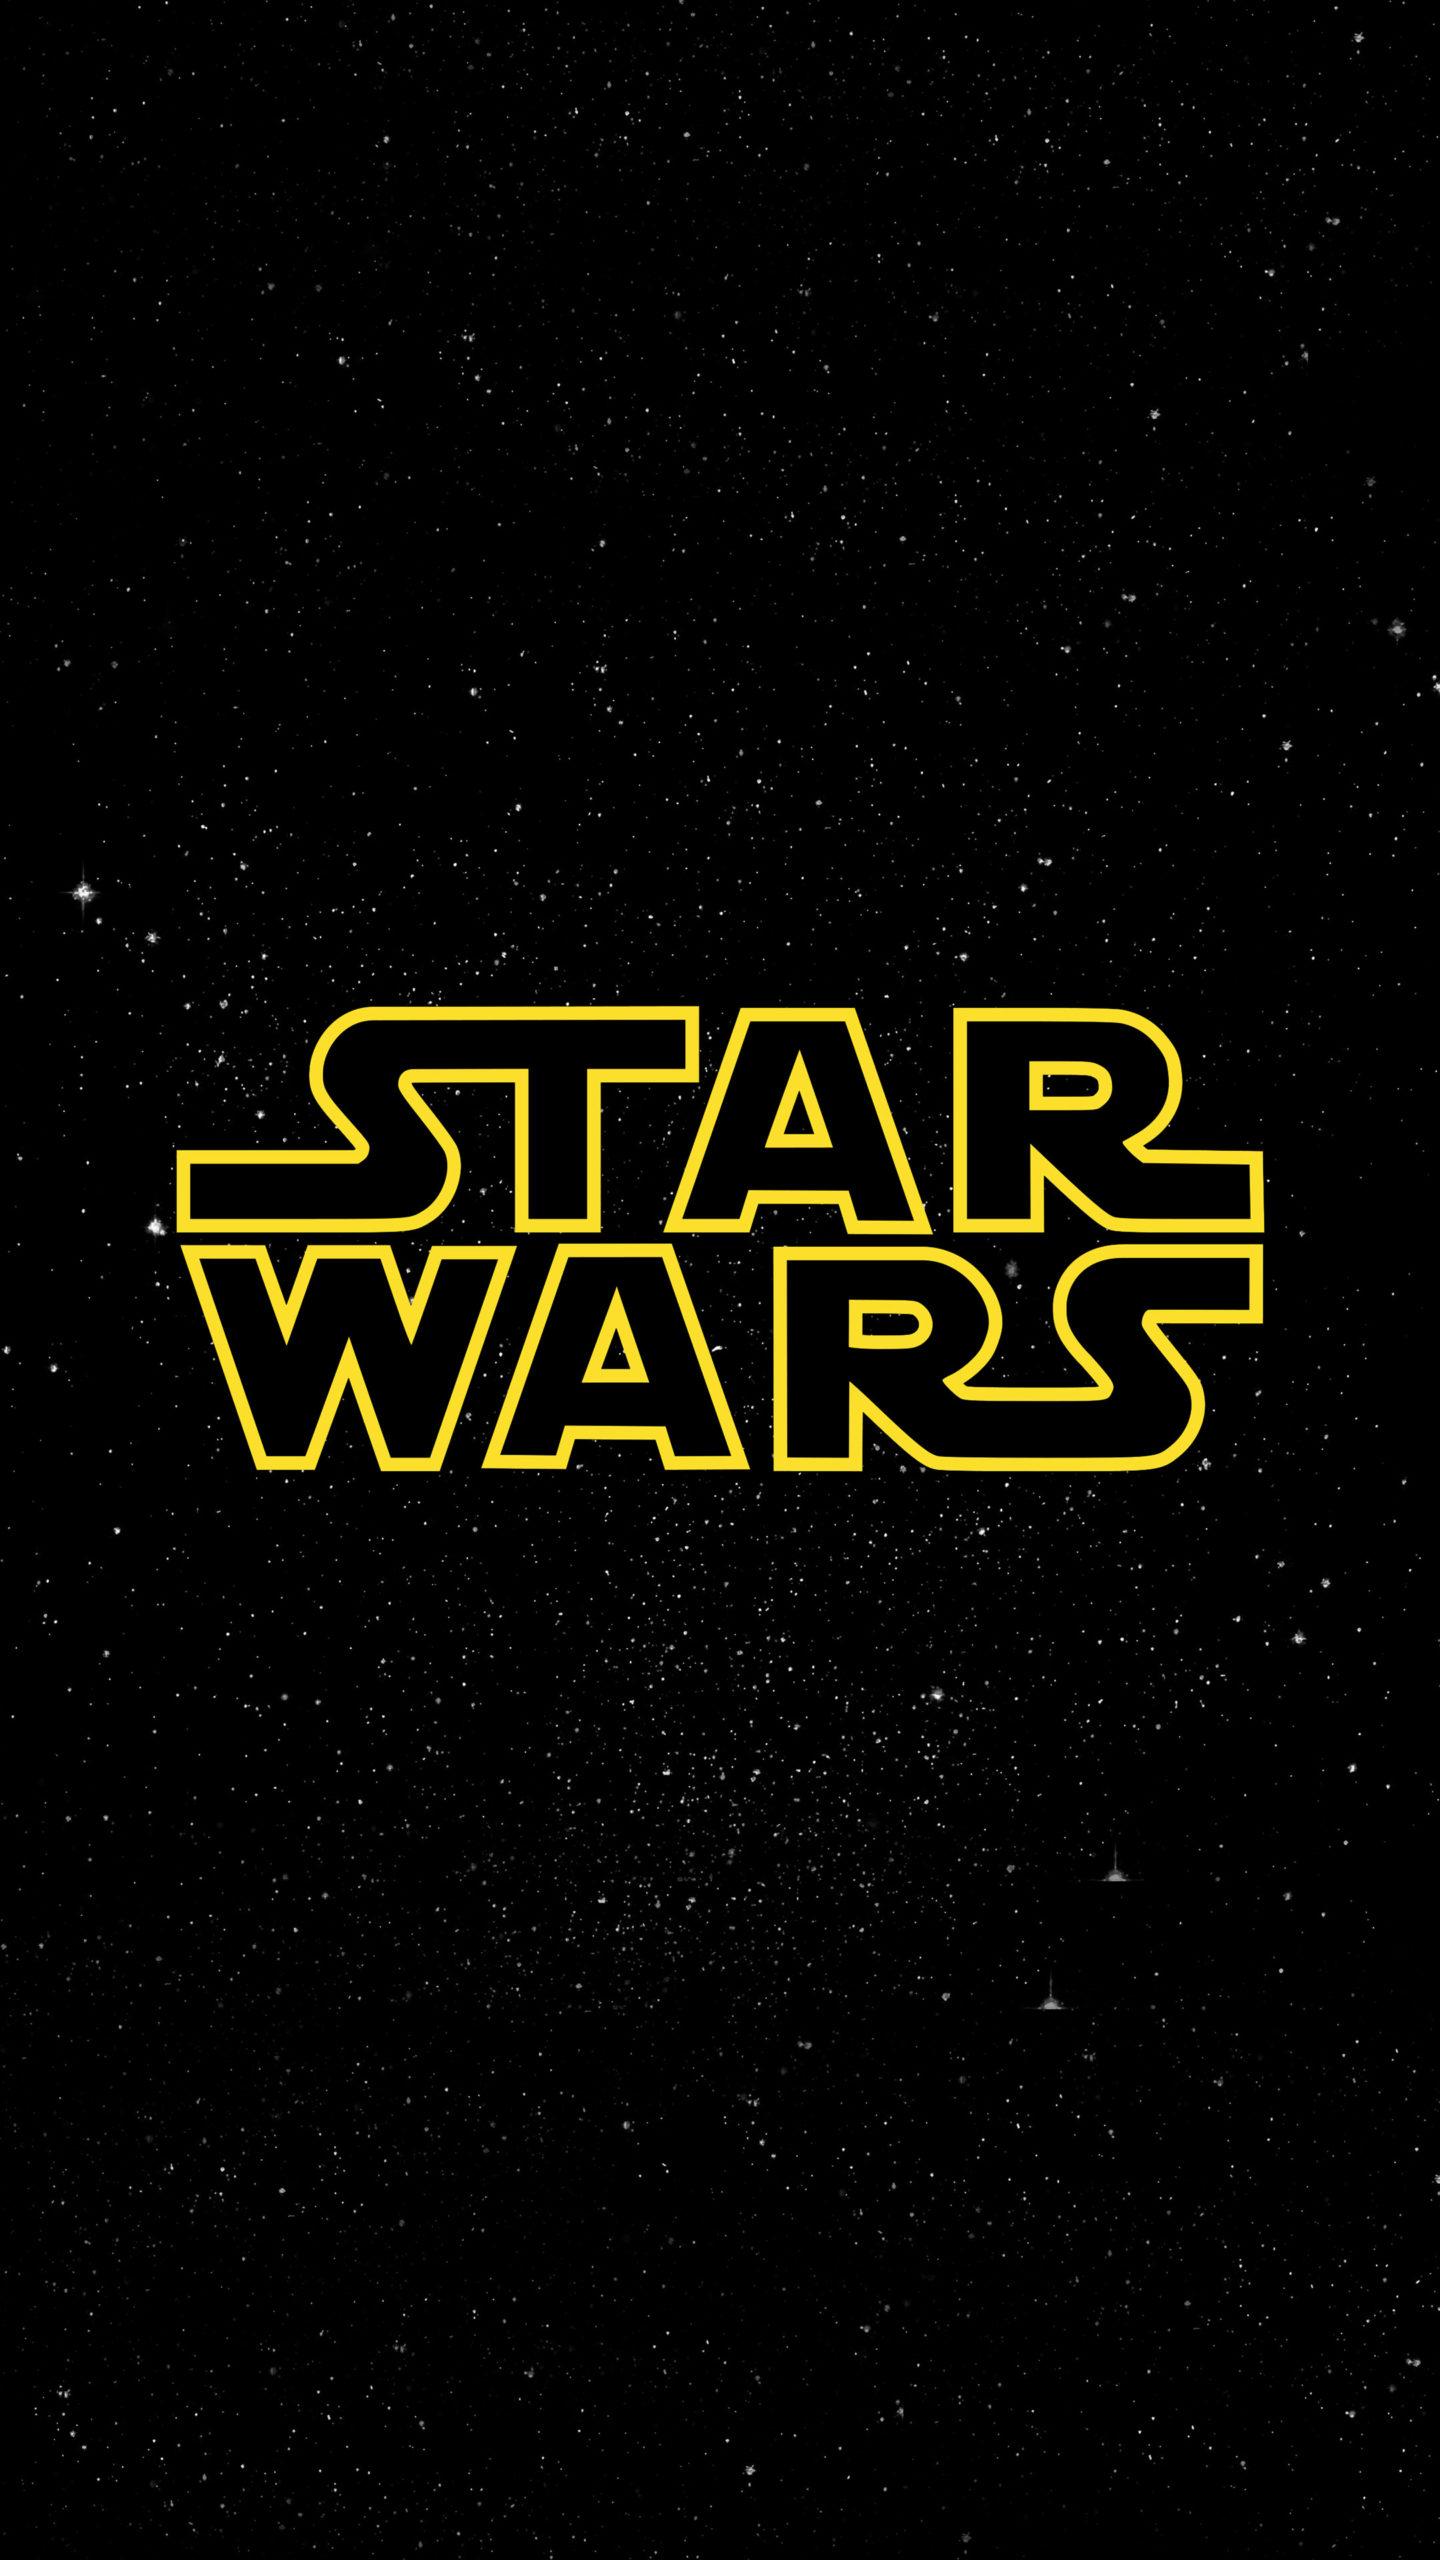 Star Wars Logo 4k Ultra Hd Mobile Wallpaper